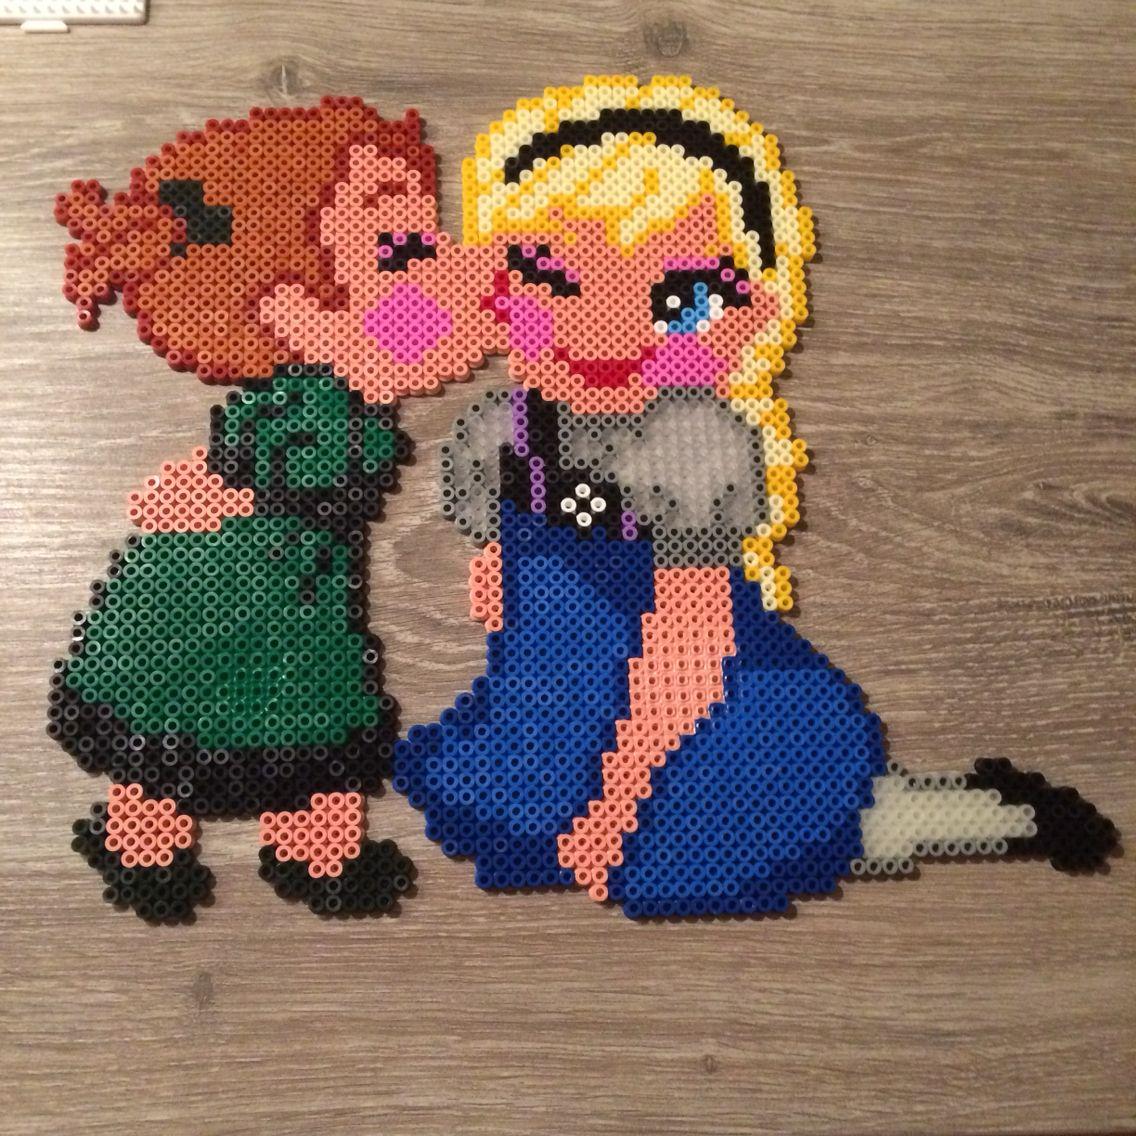 Anna and Elsa - Frozen hama beads by Shirley Boon | Hama Beads ...